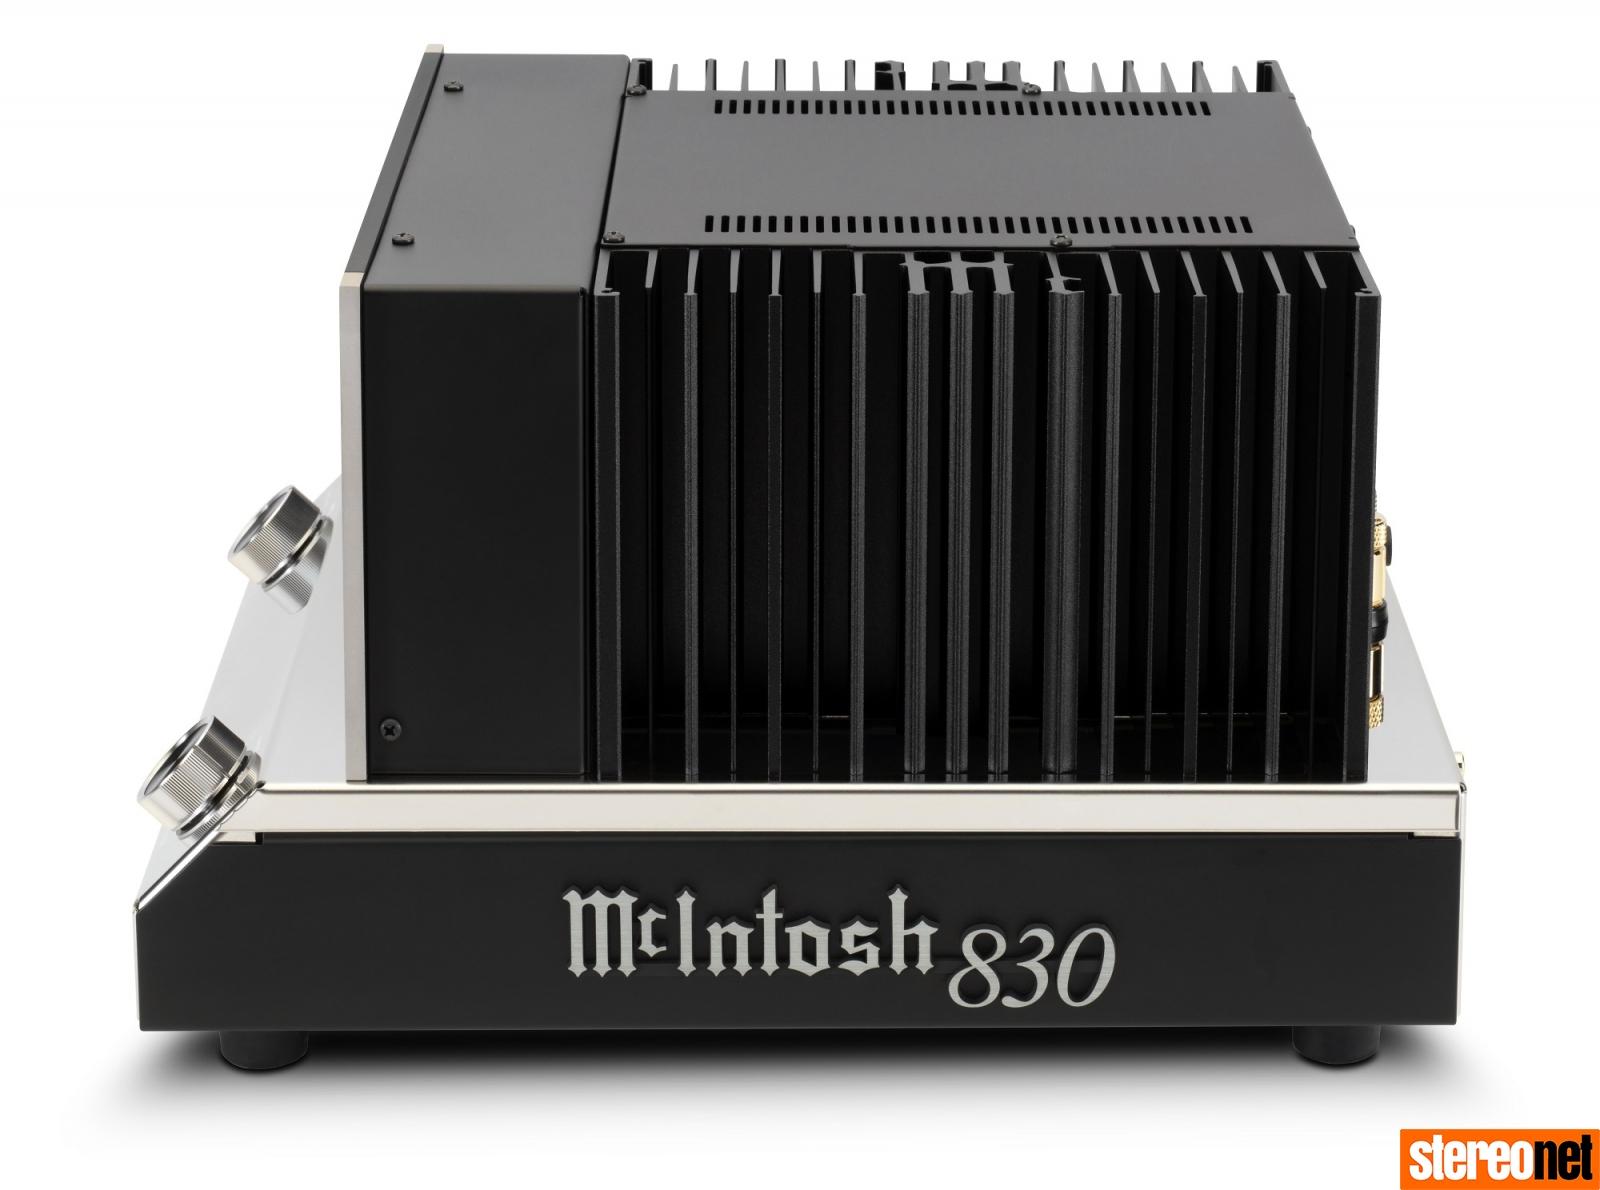 McIntosh MC830 monoblock power amp